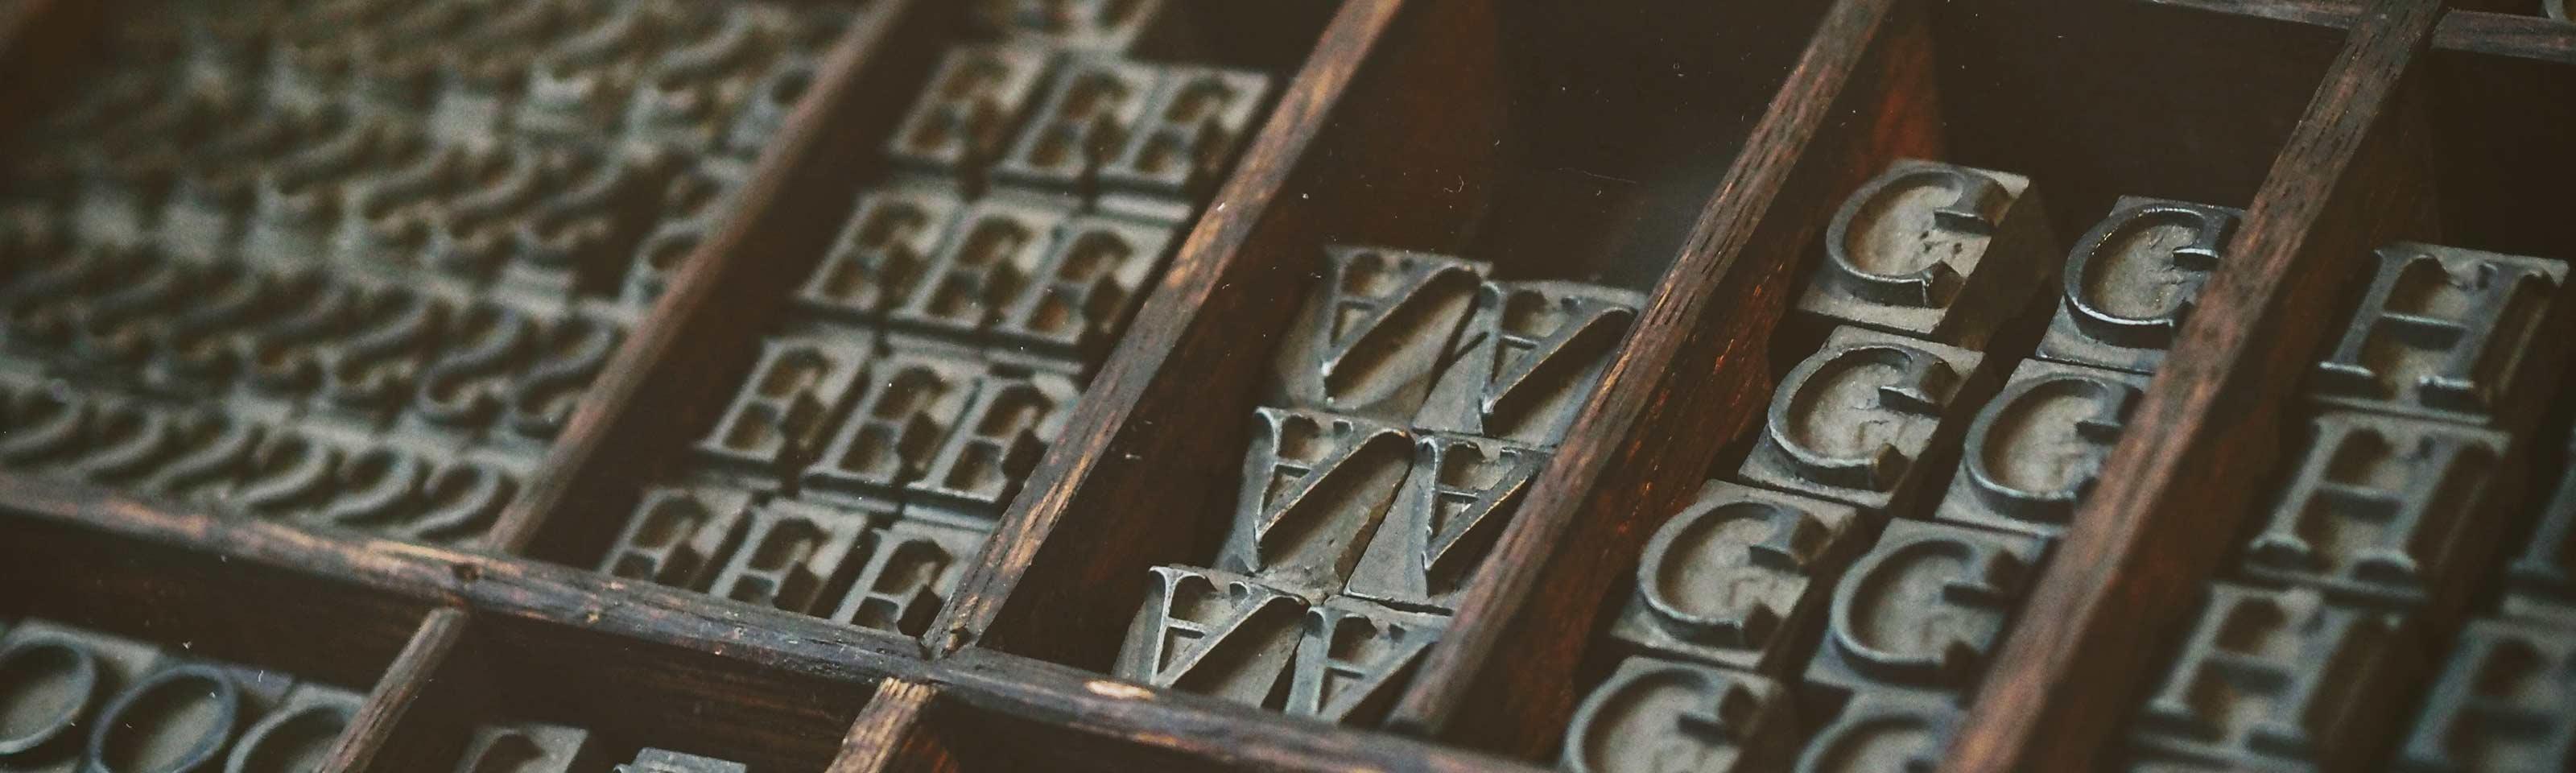 A photo of letterpress type.